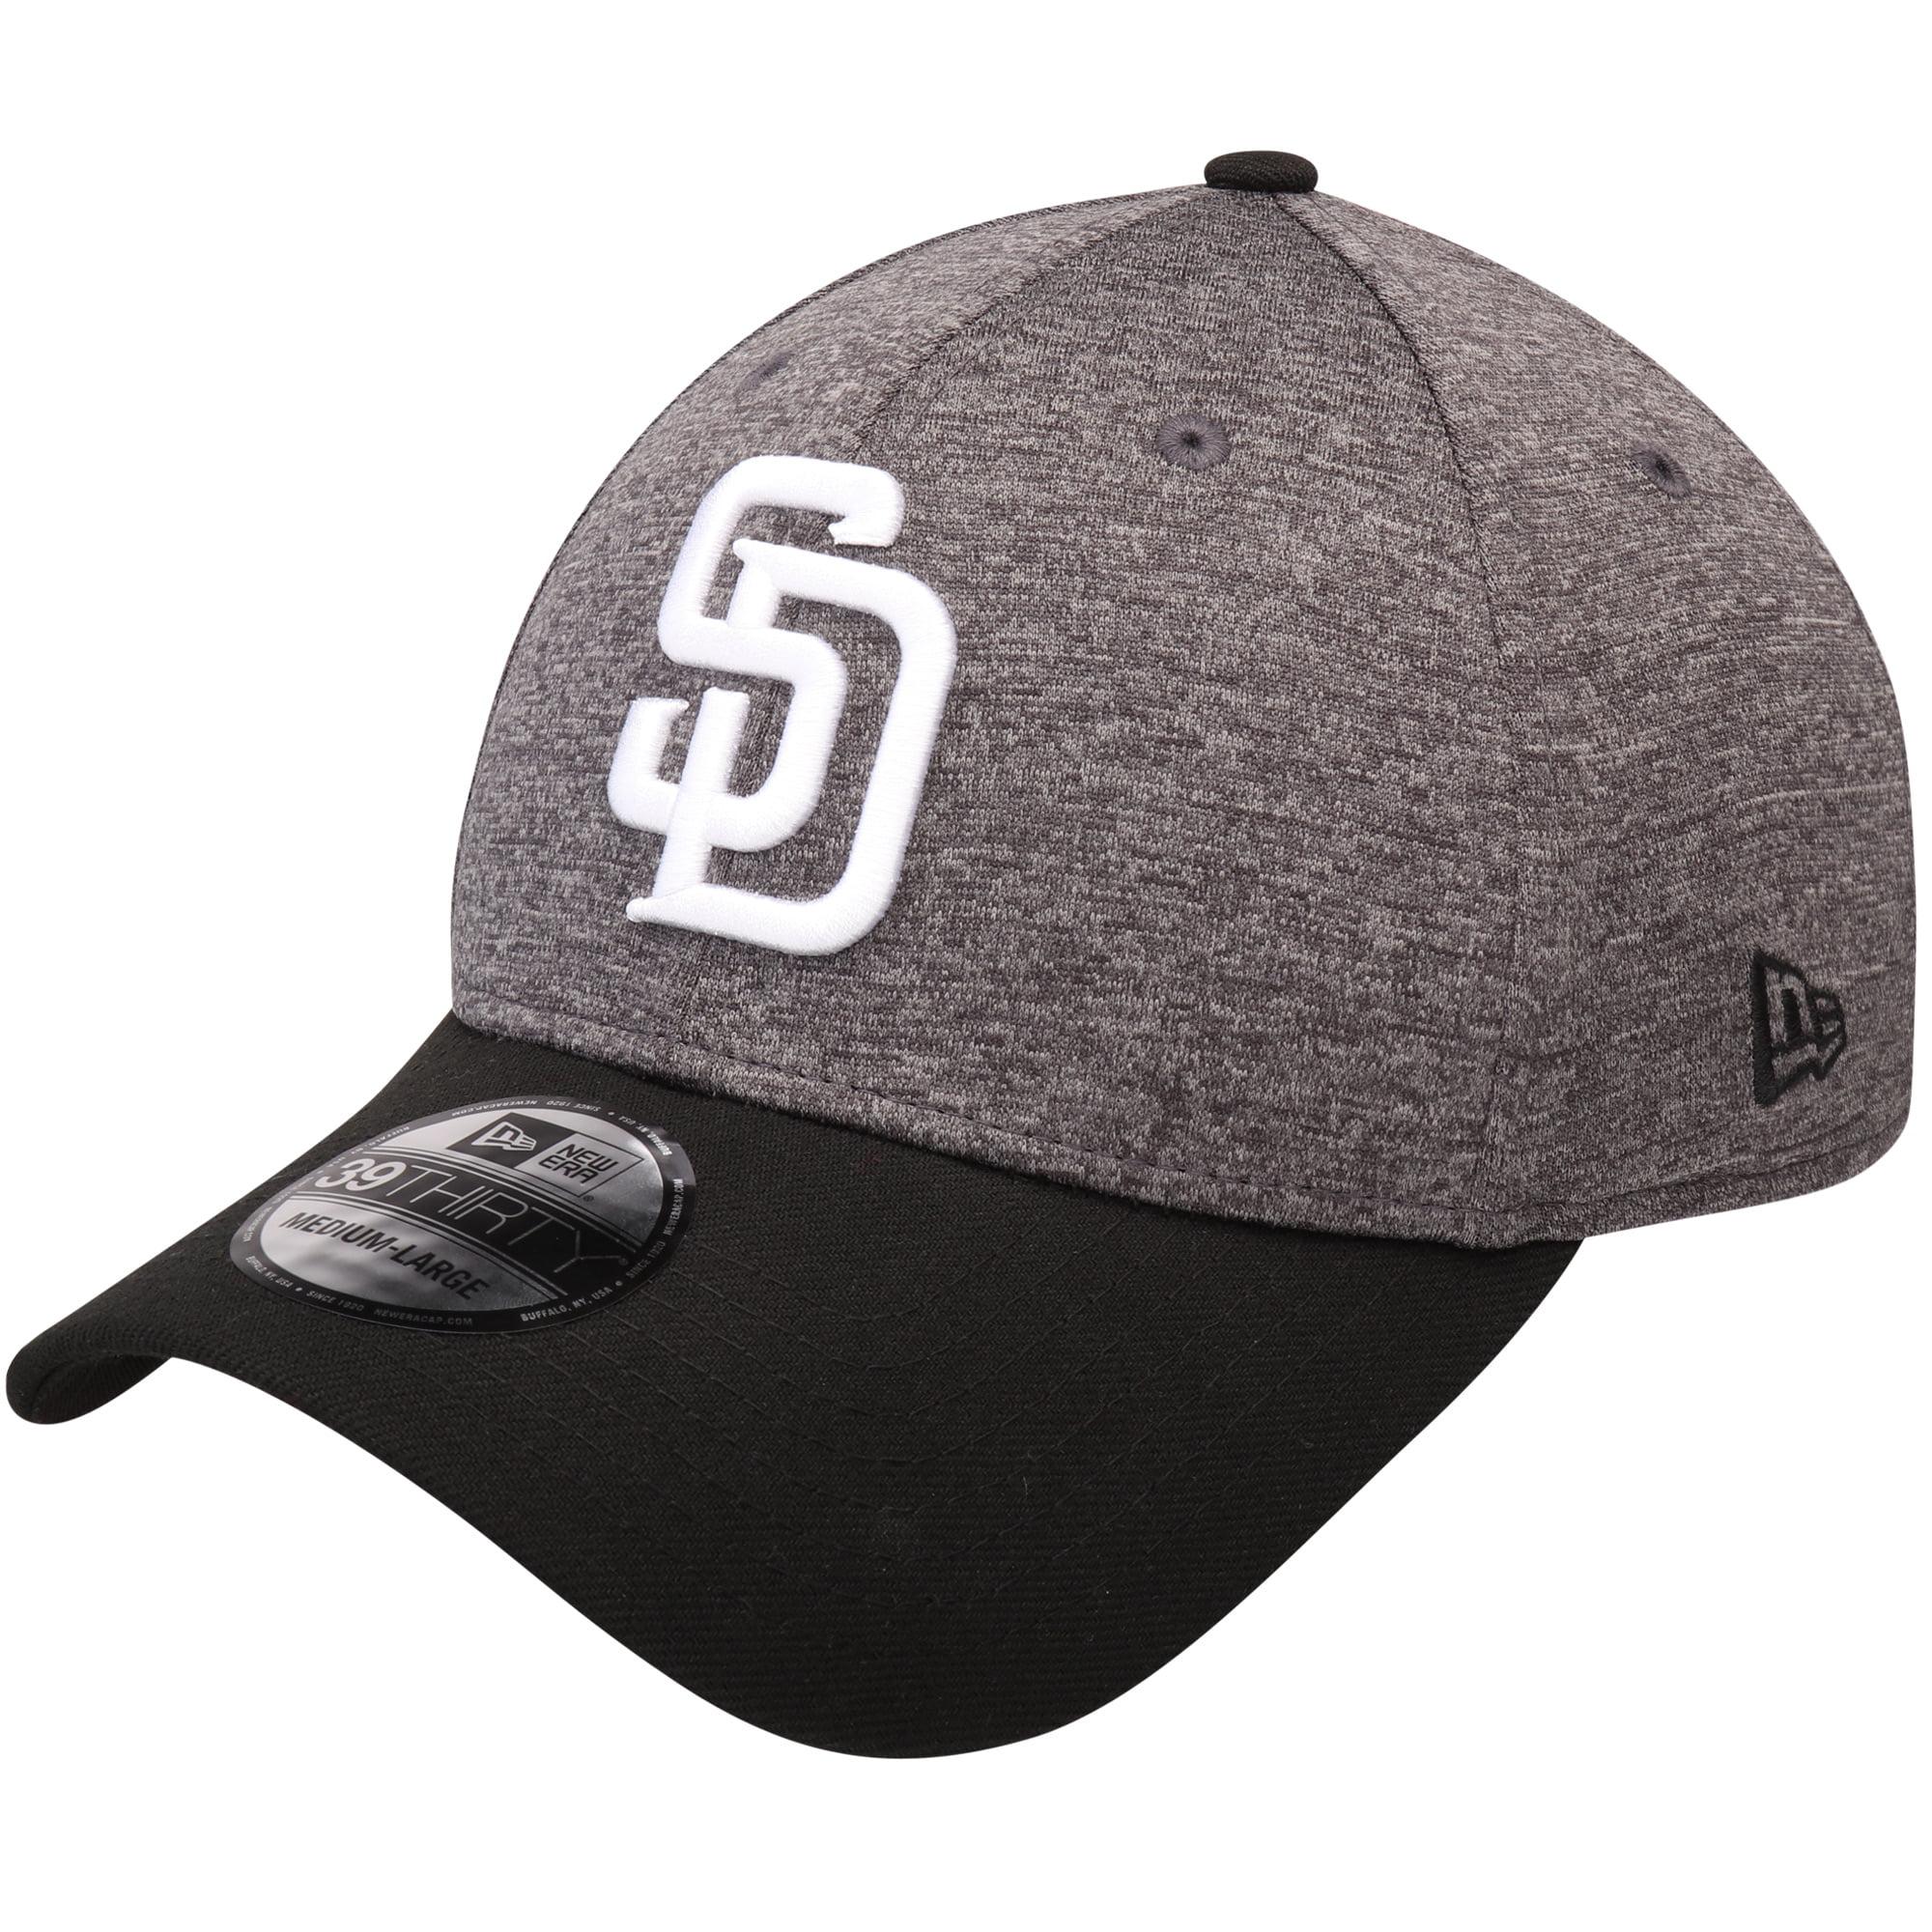 San Diego Padres New Era Shadow Tech 39THIRTY Flex Hat - Heathered Gray/Black